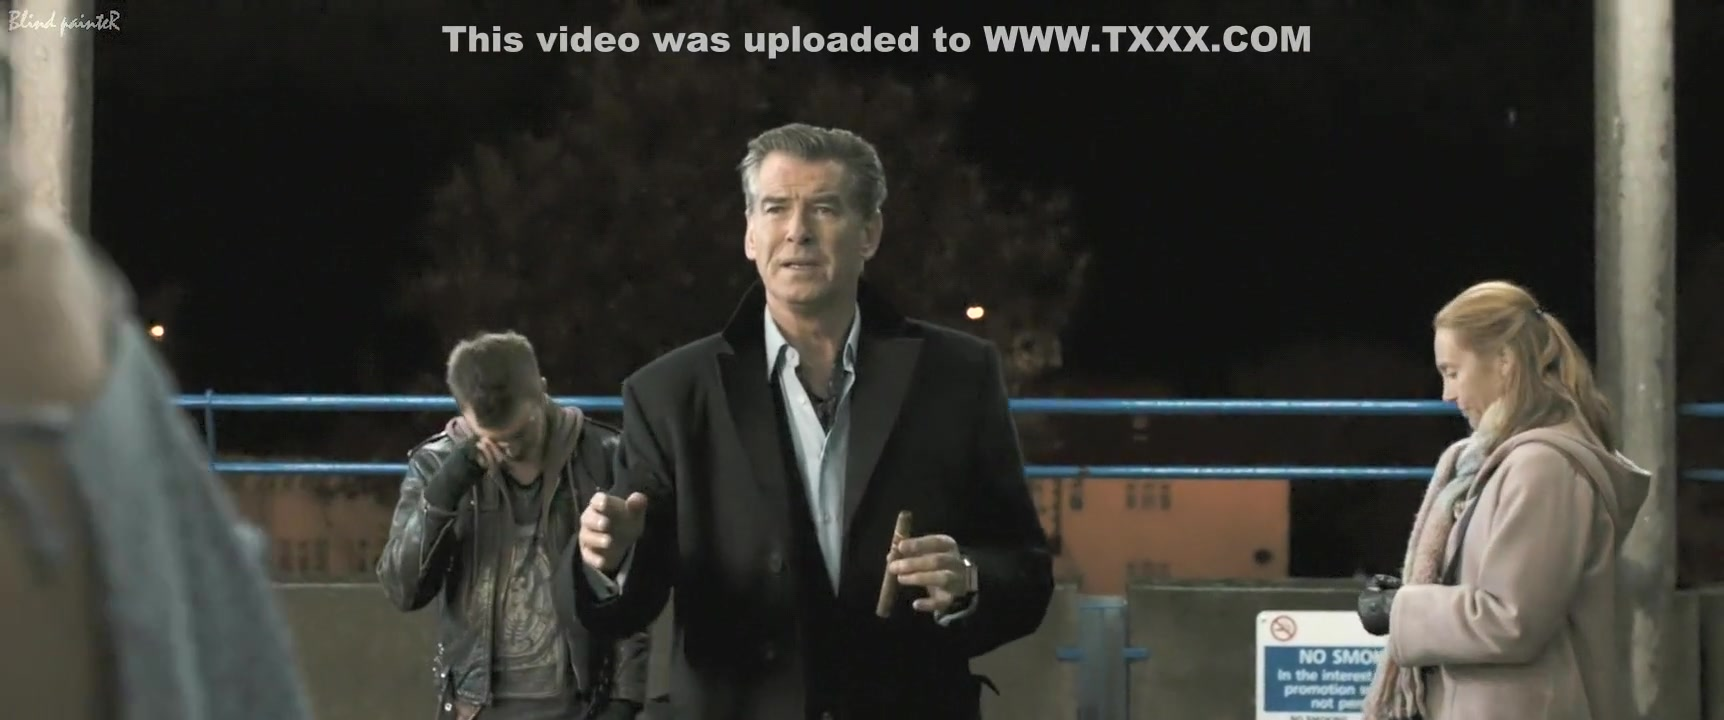 Anal Porn Hd Video Porn Pics & Movies